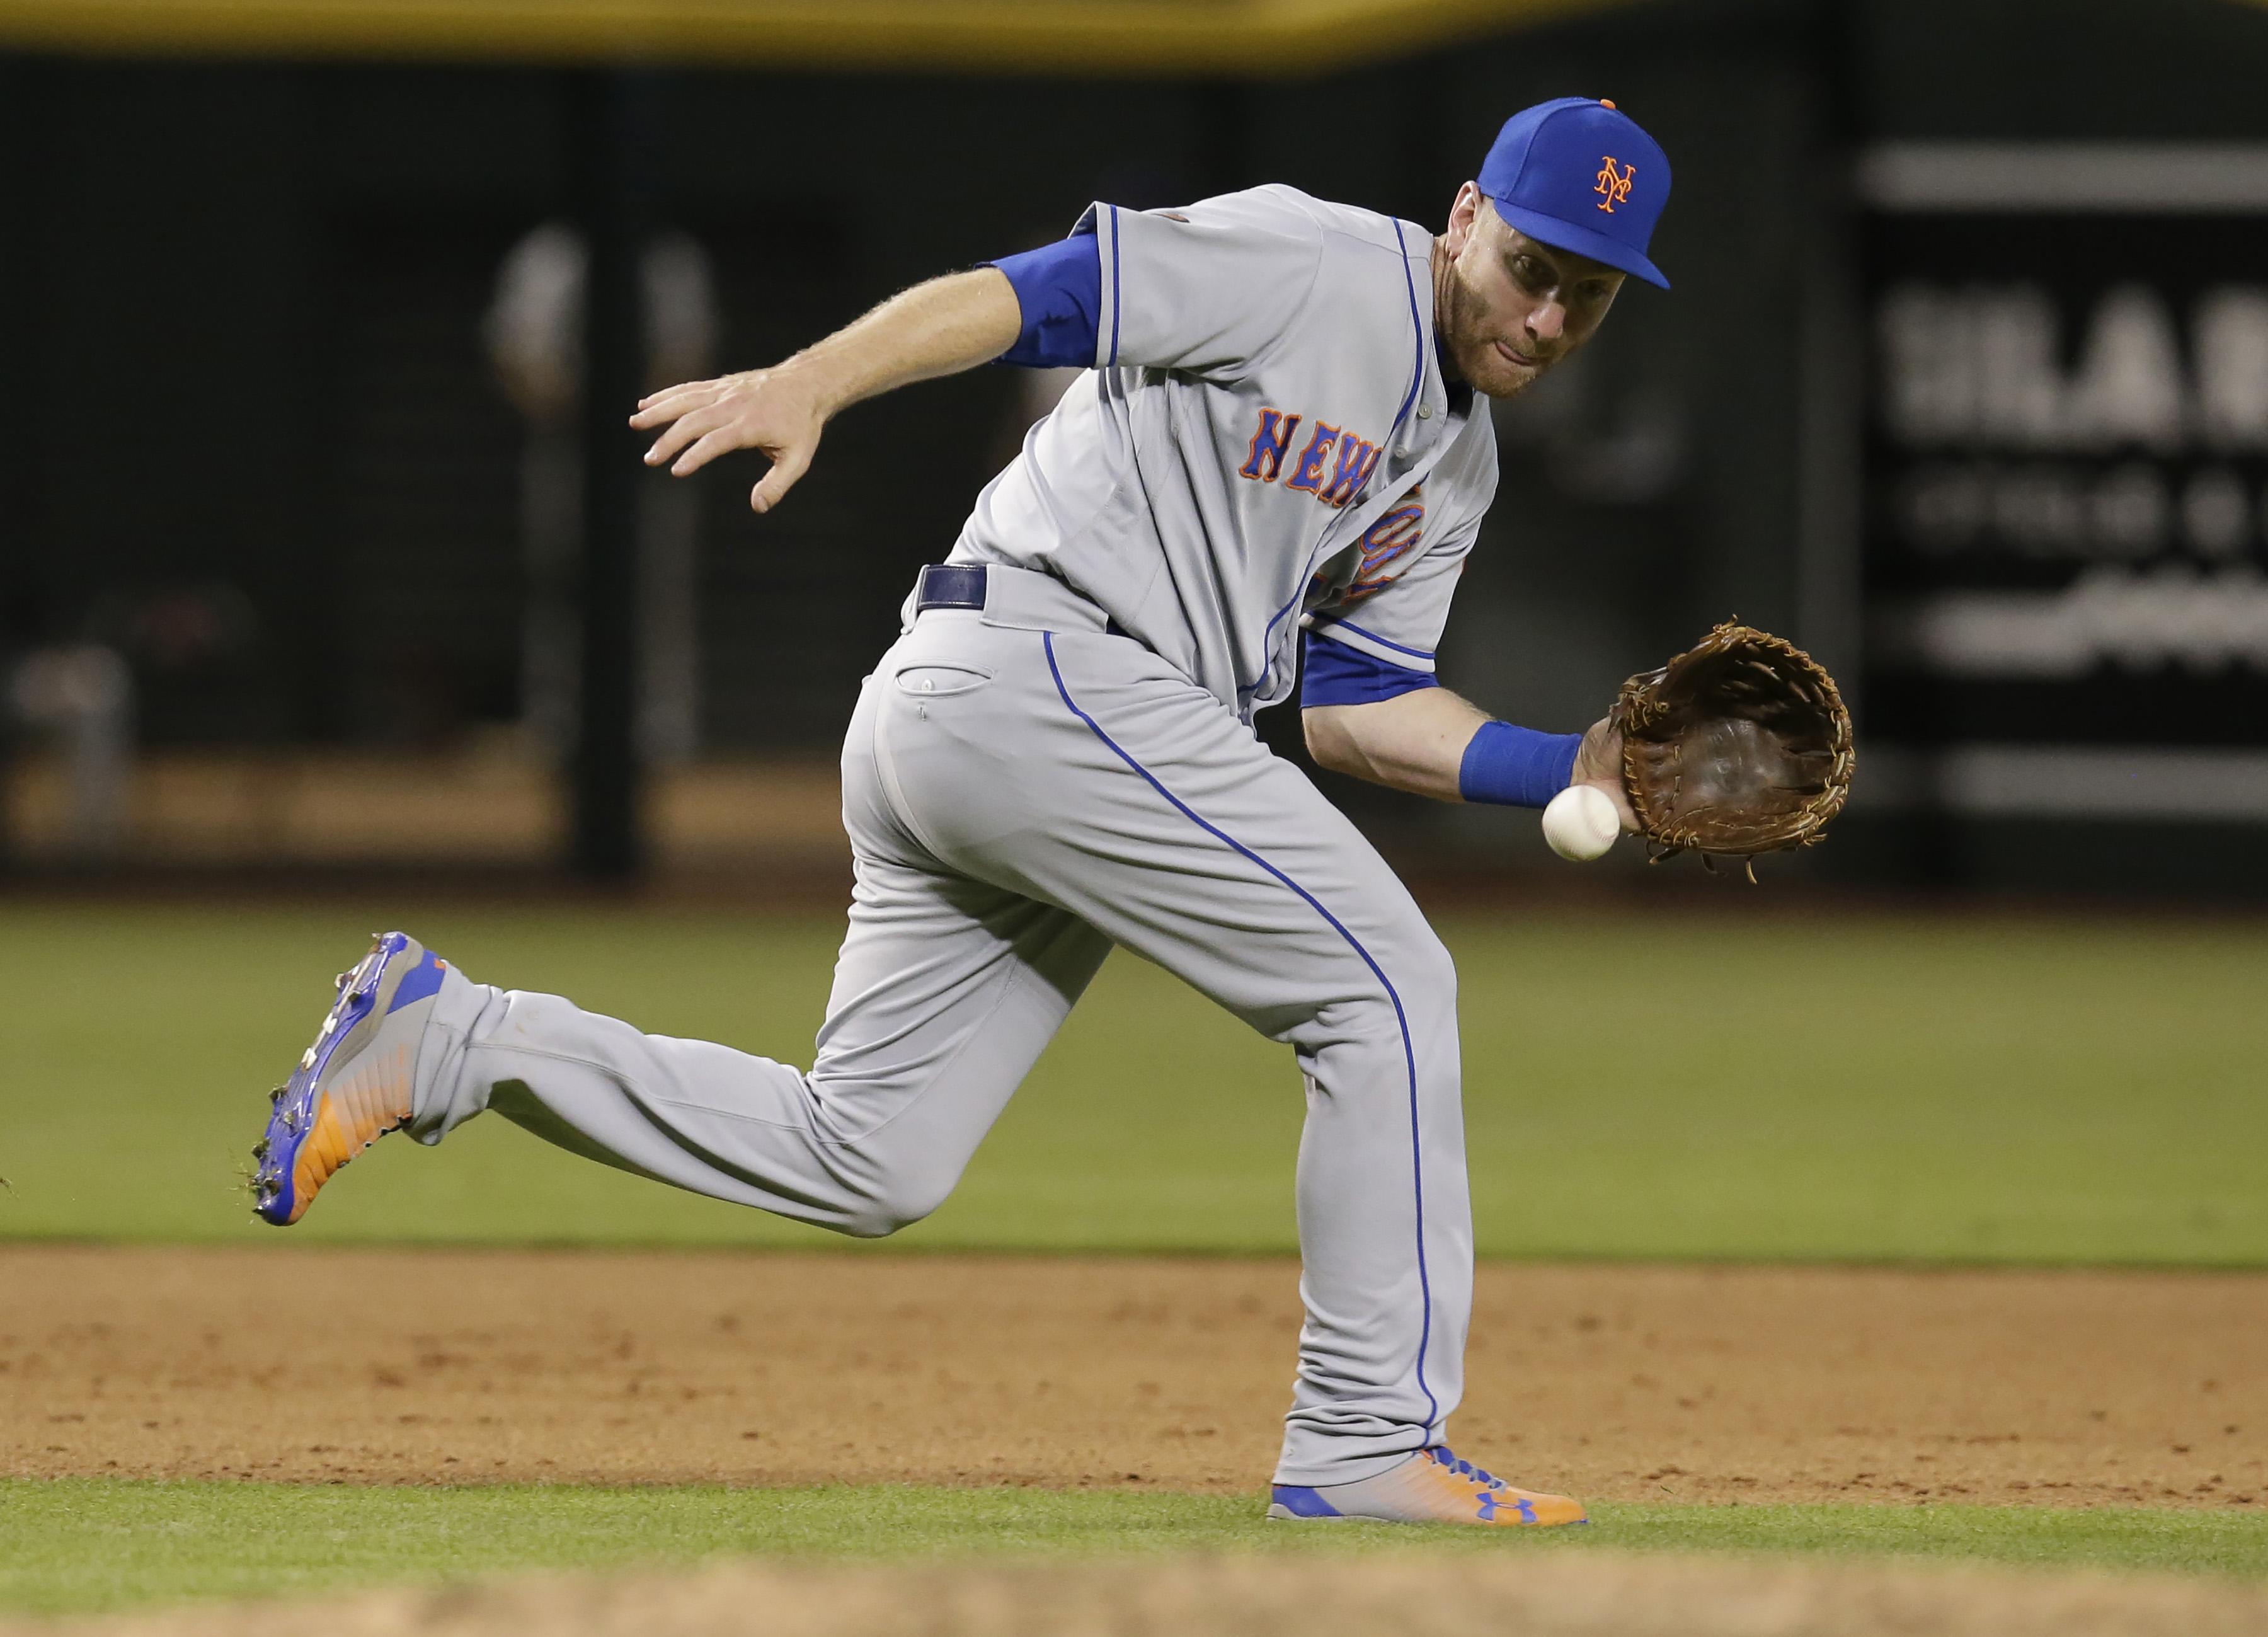 6/15/18 Game Preview: New York Mets at Arizona Diamondbacks